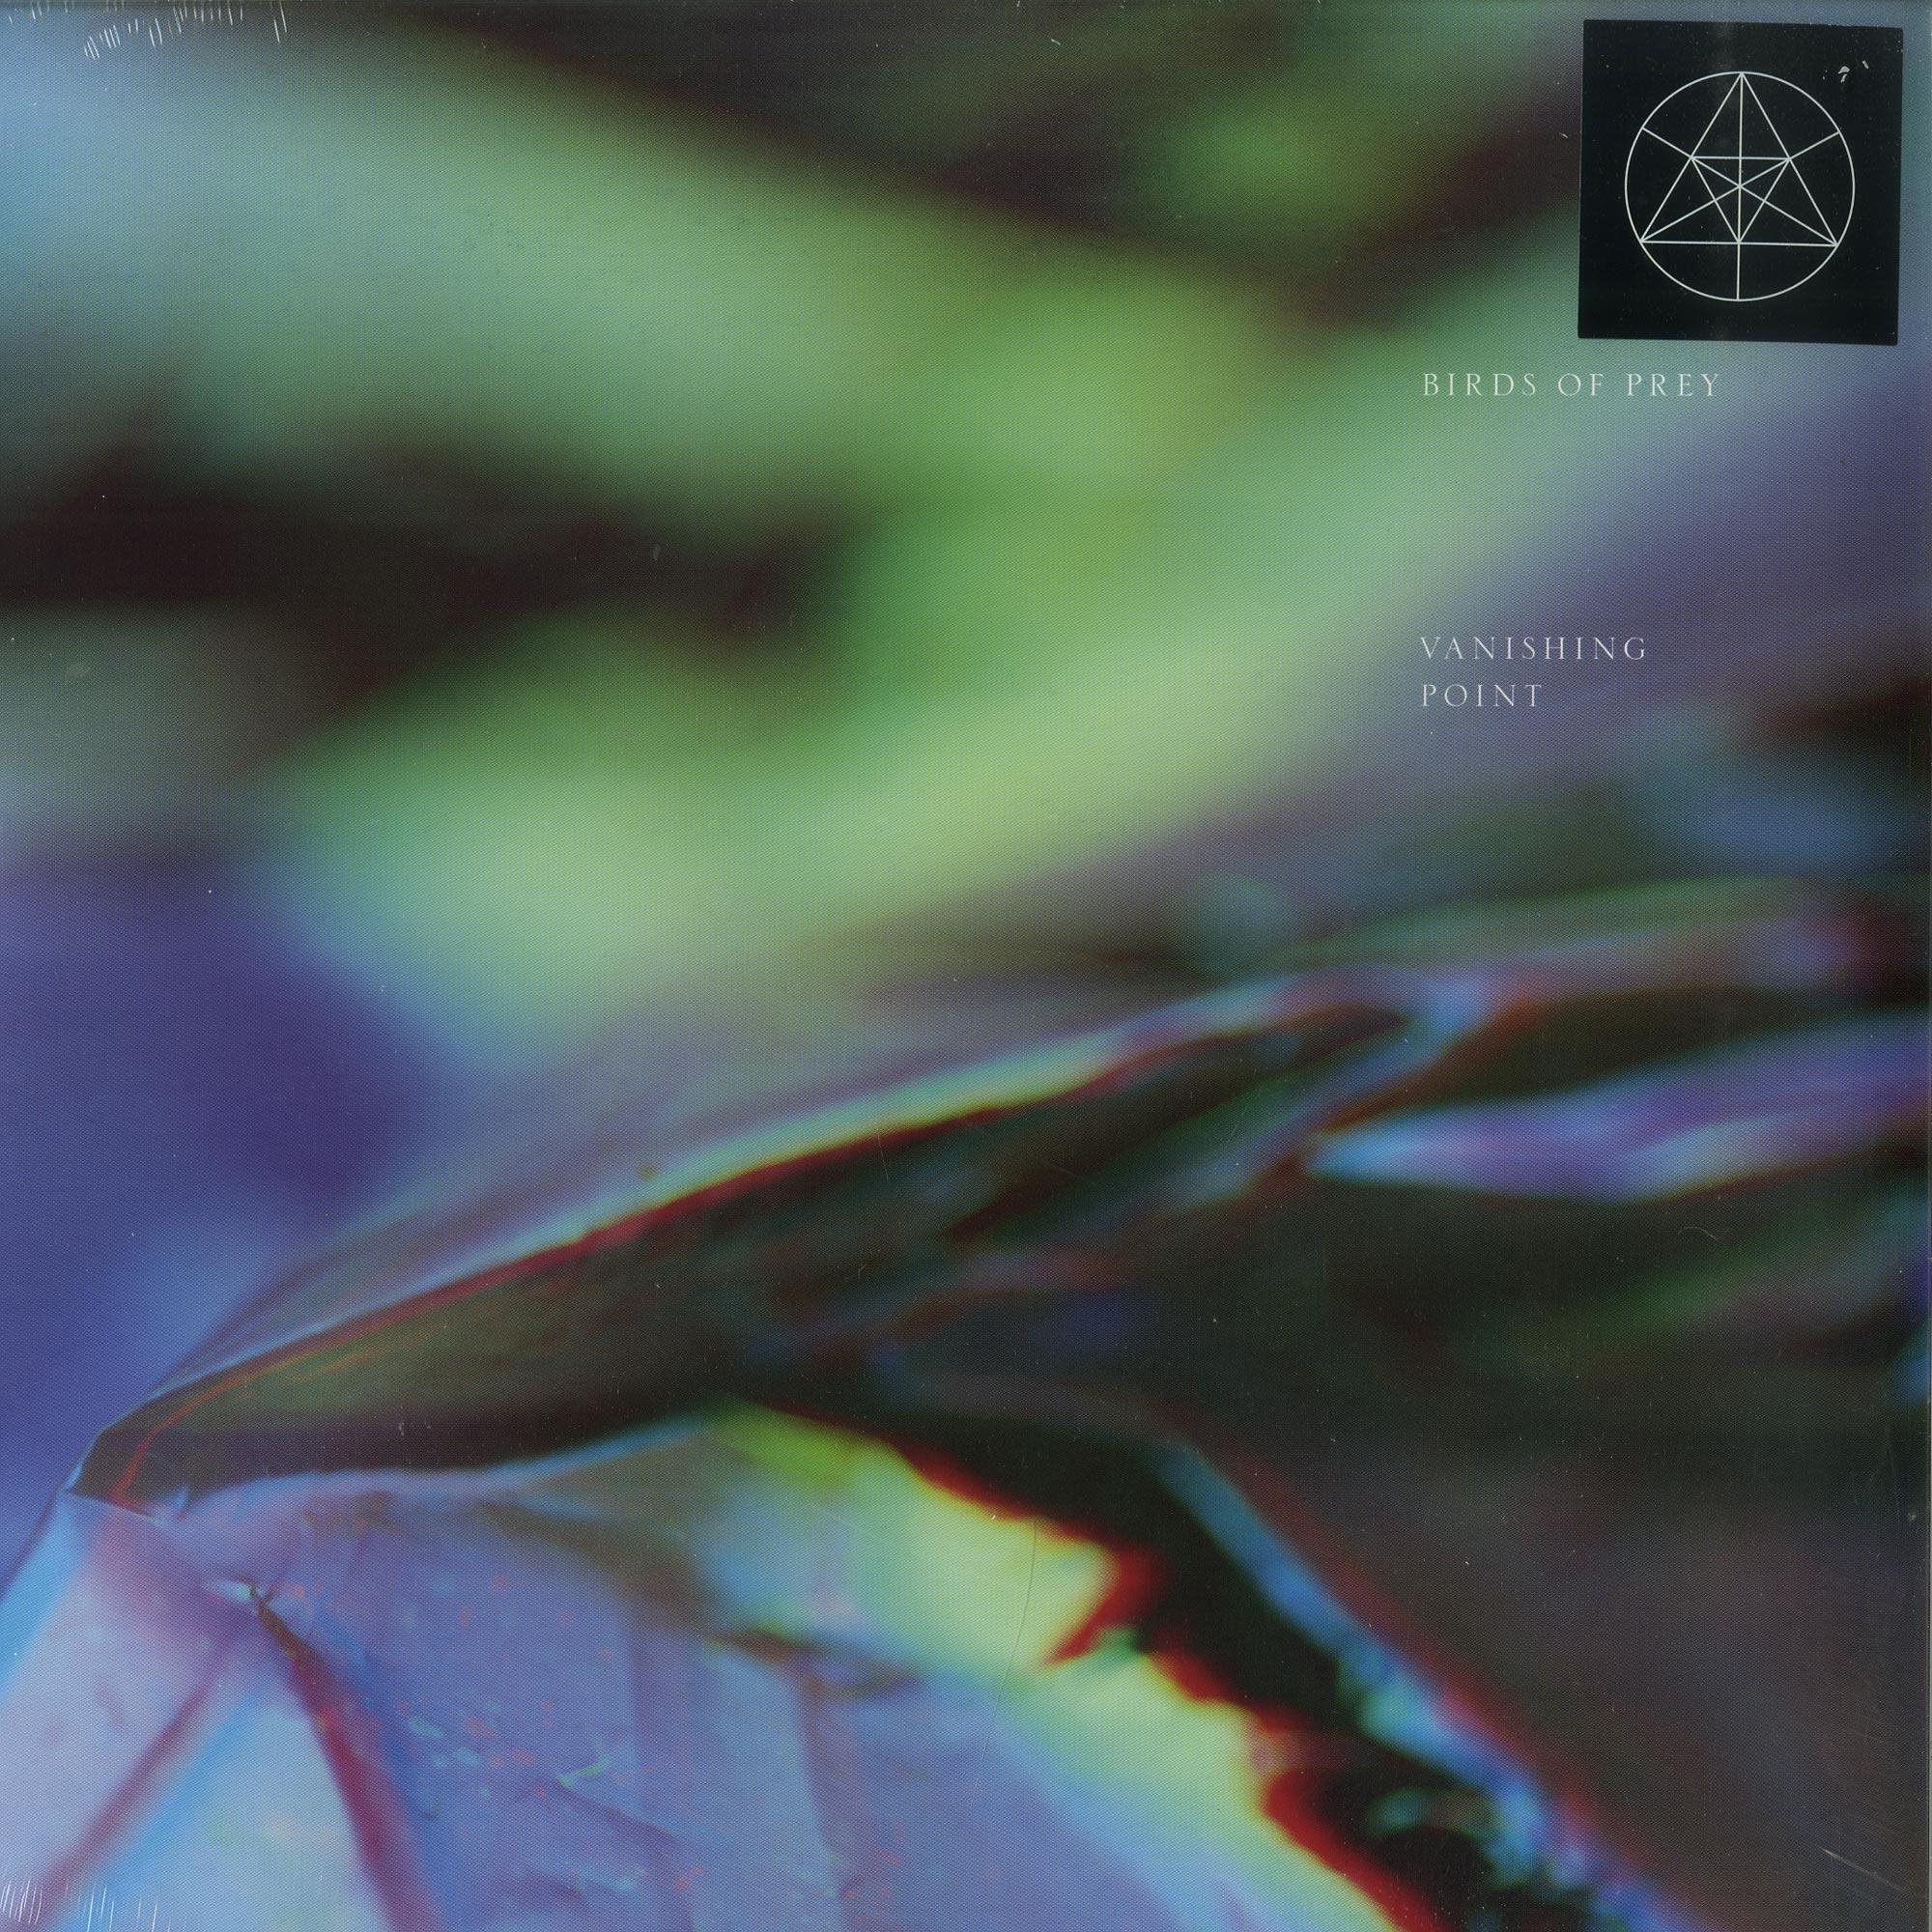 Birds Of Prey Vanishing Point Lp Translucent Blue Vinyl